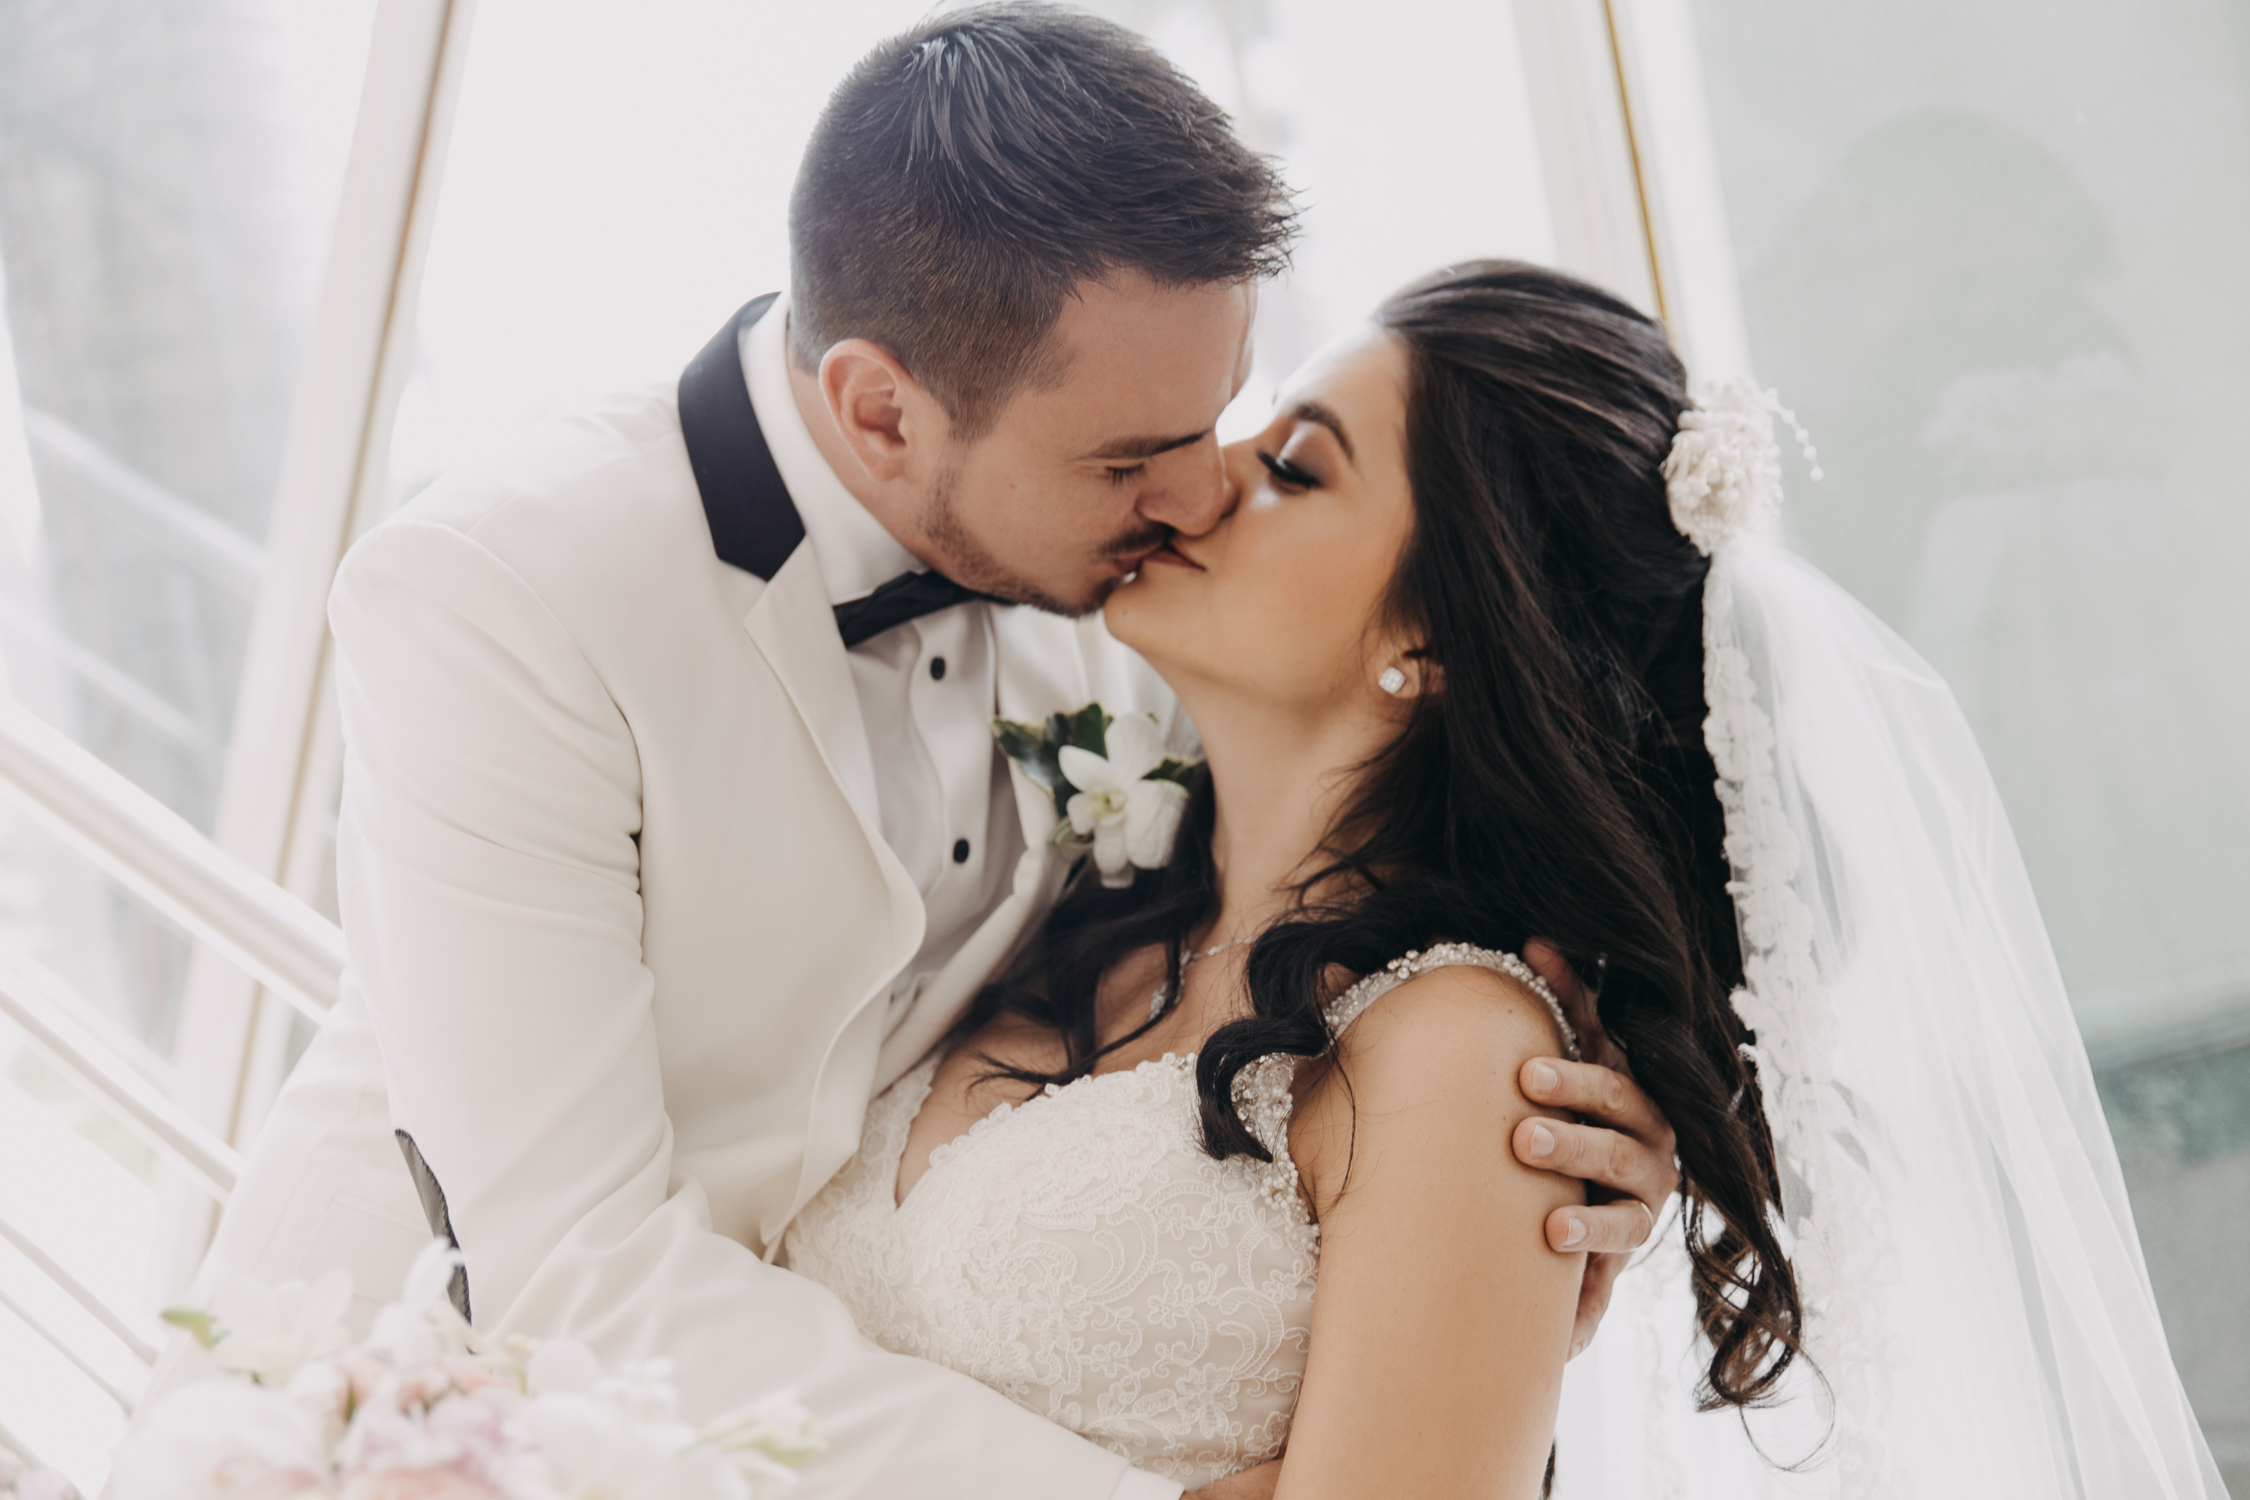 Michelle-Agurto-Fotografia-Bodas-Ecuador-Destination-Wedding-Photographer-Daniela-Dirk-36.JPG